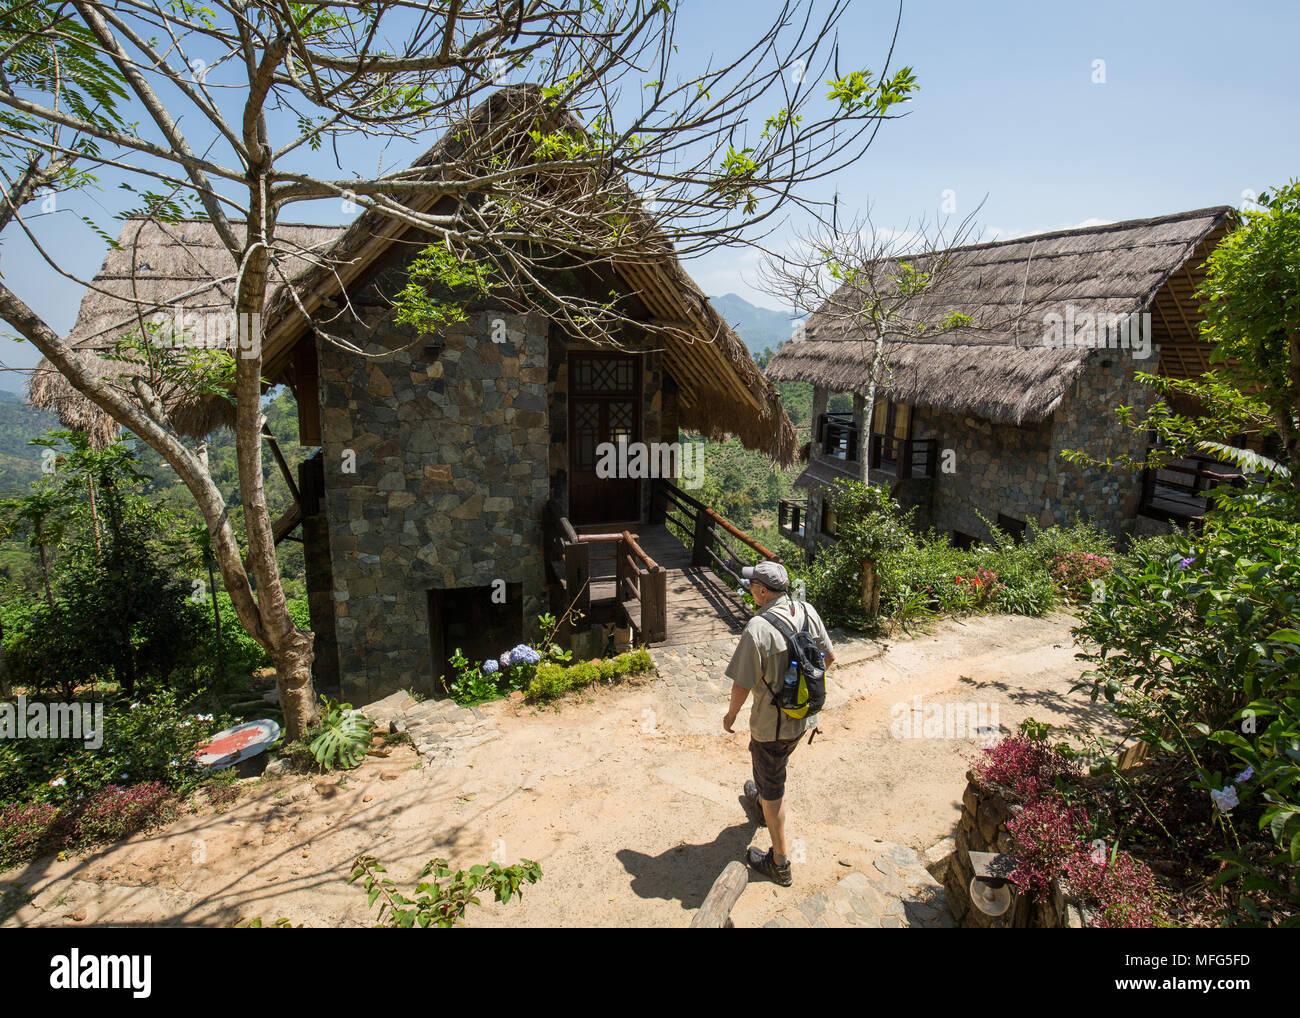 Tourist walking towards his lodge in the 98 Acres Resort & Spa, Ella, Badulla District, Uva Province, Sri Lanka, Asia. - Stock Image